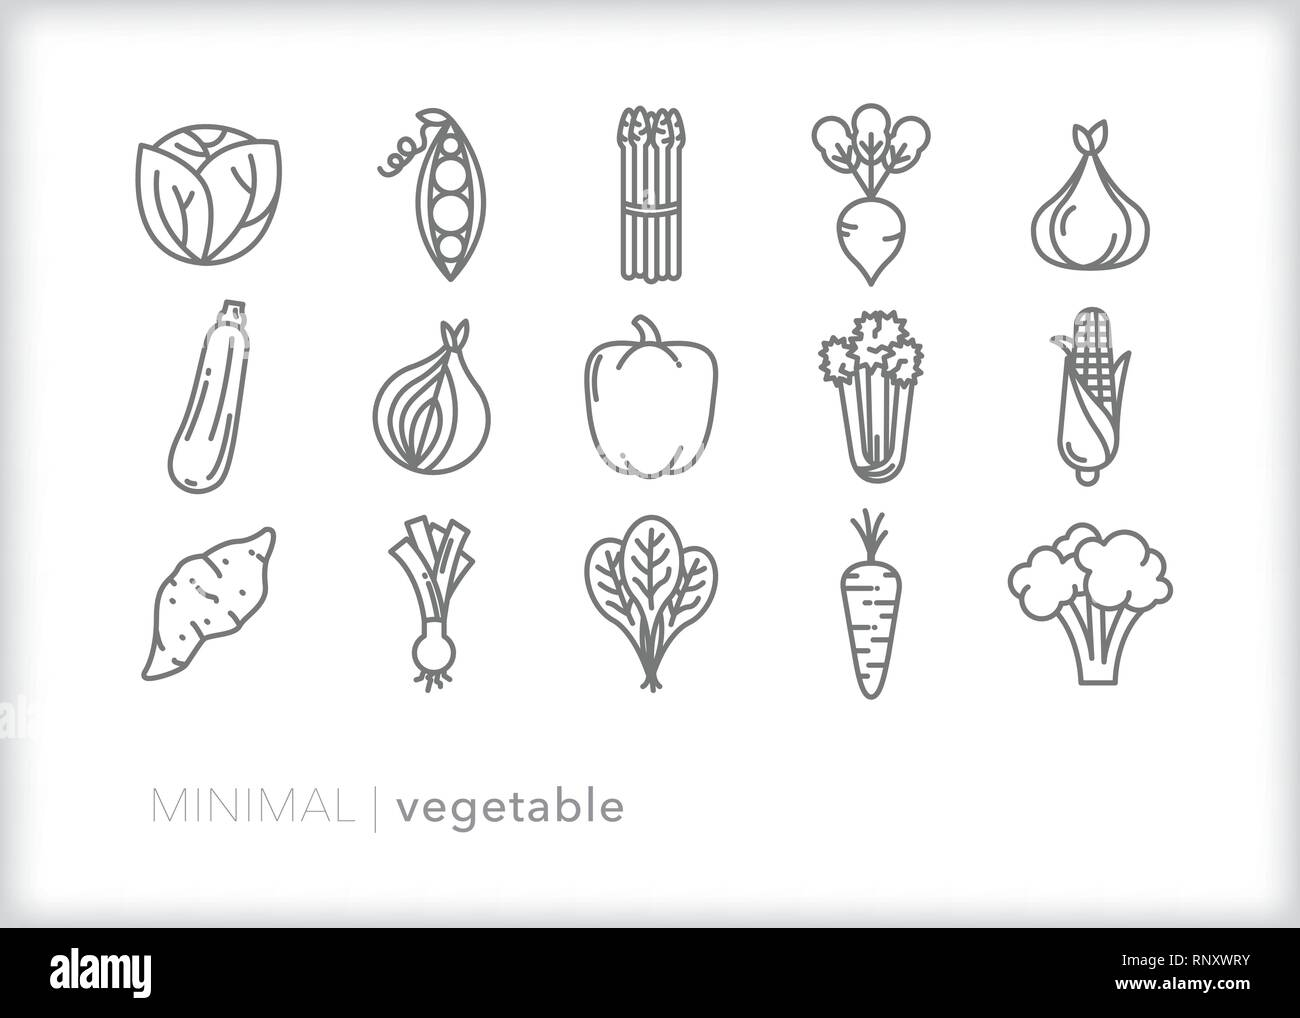 Set of 15 food vegetable line icons of fresh, healthy farm veggies including greens, pepper, squash, onion, garlic, asparagus, carrots, broccoli, corn - Stock Vector